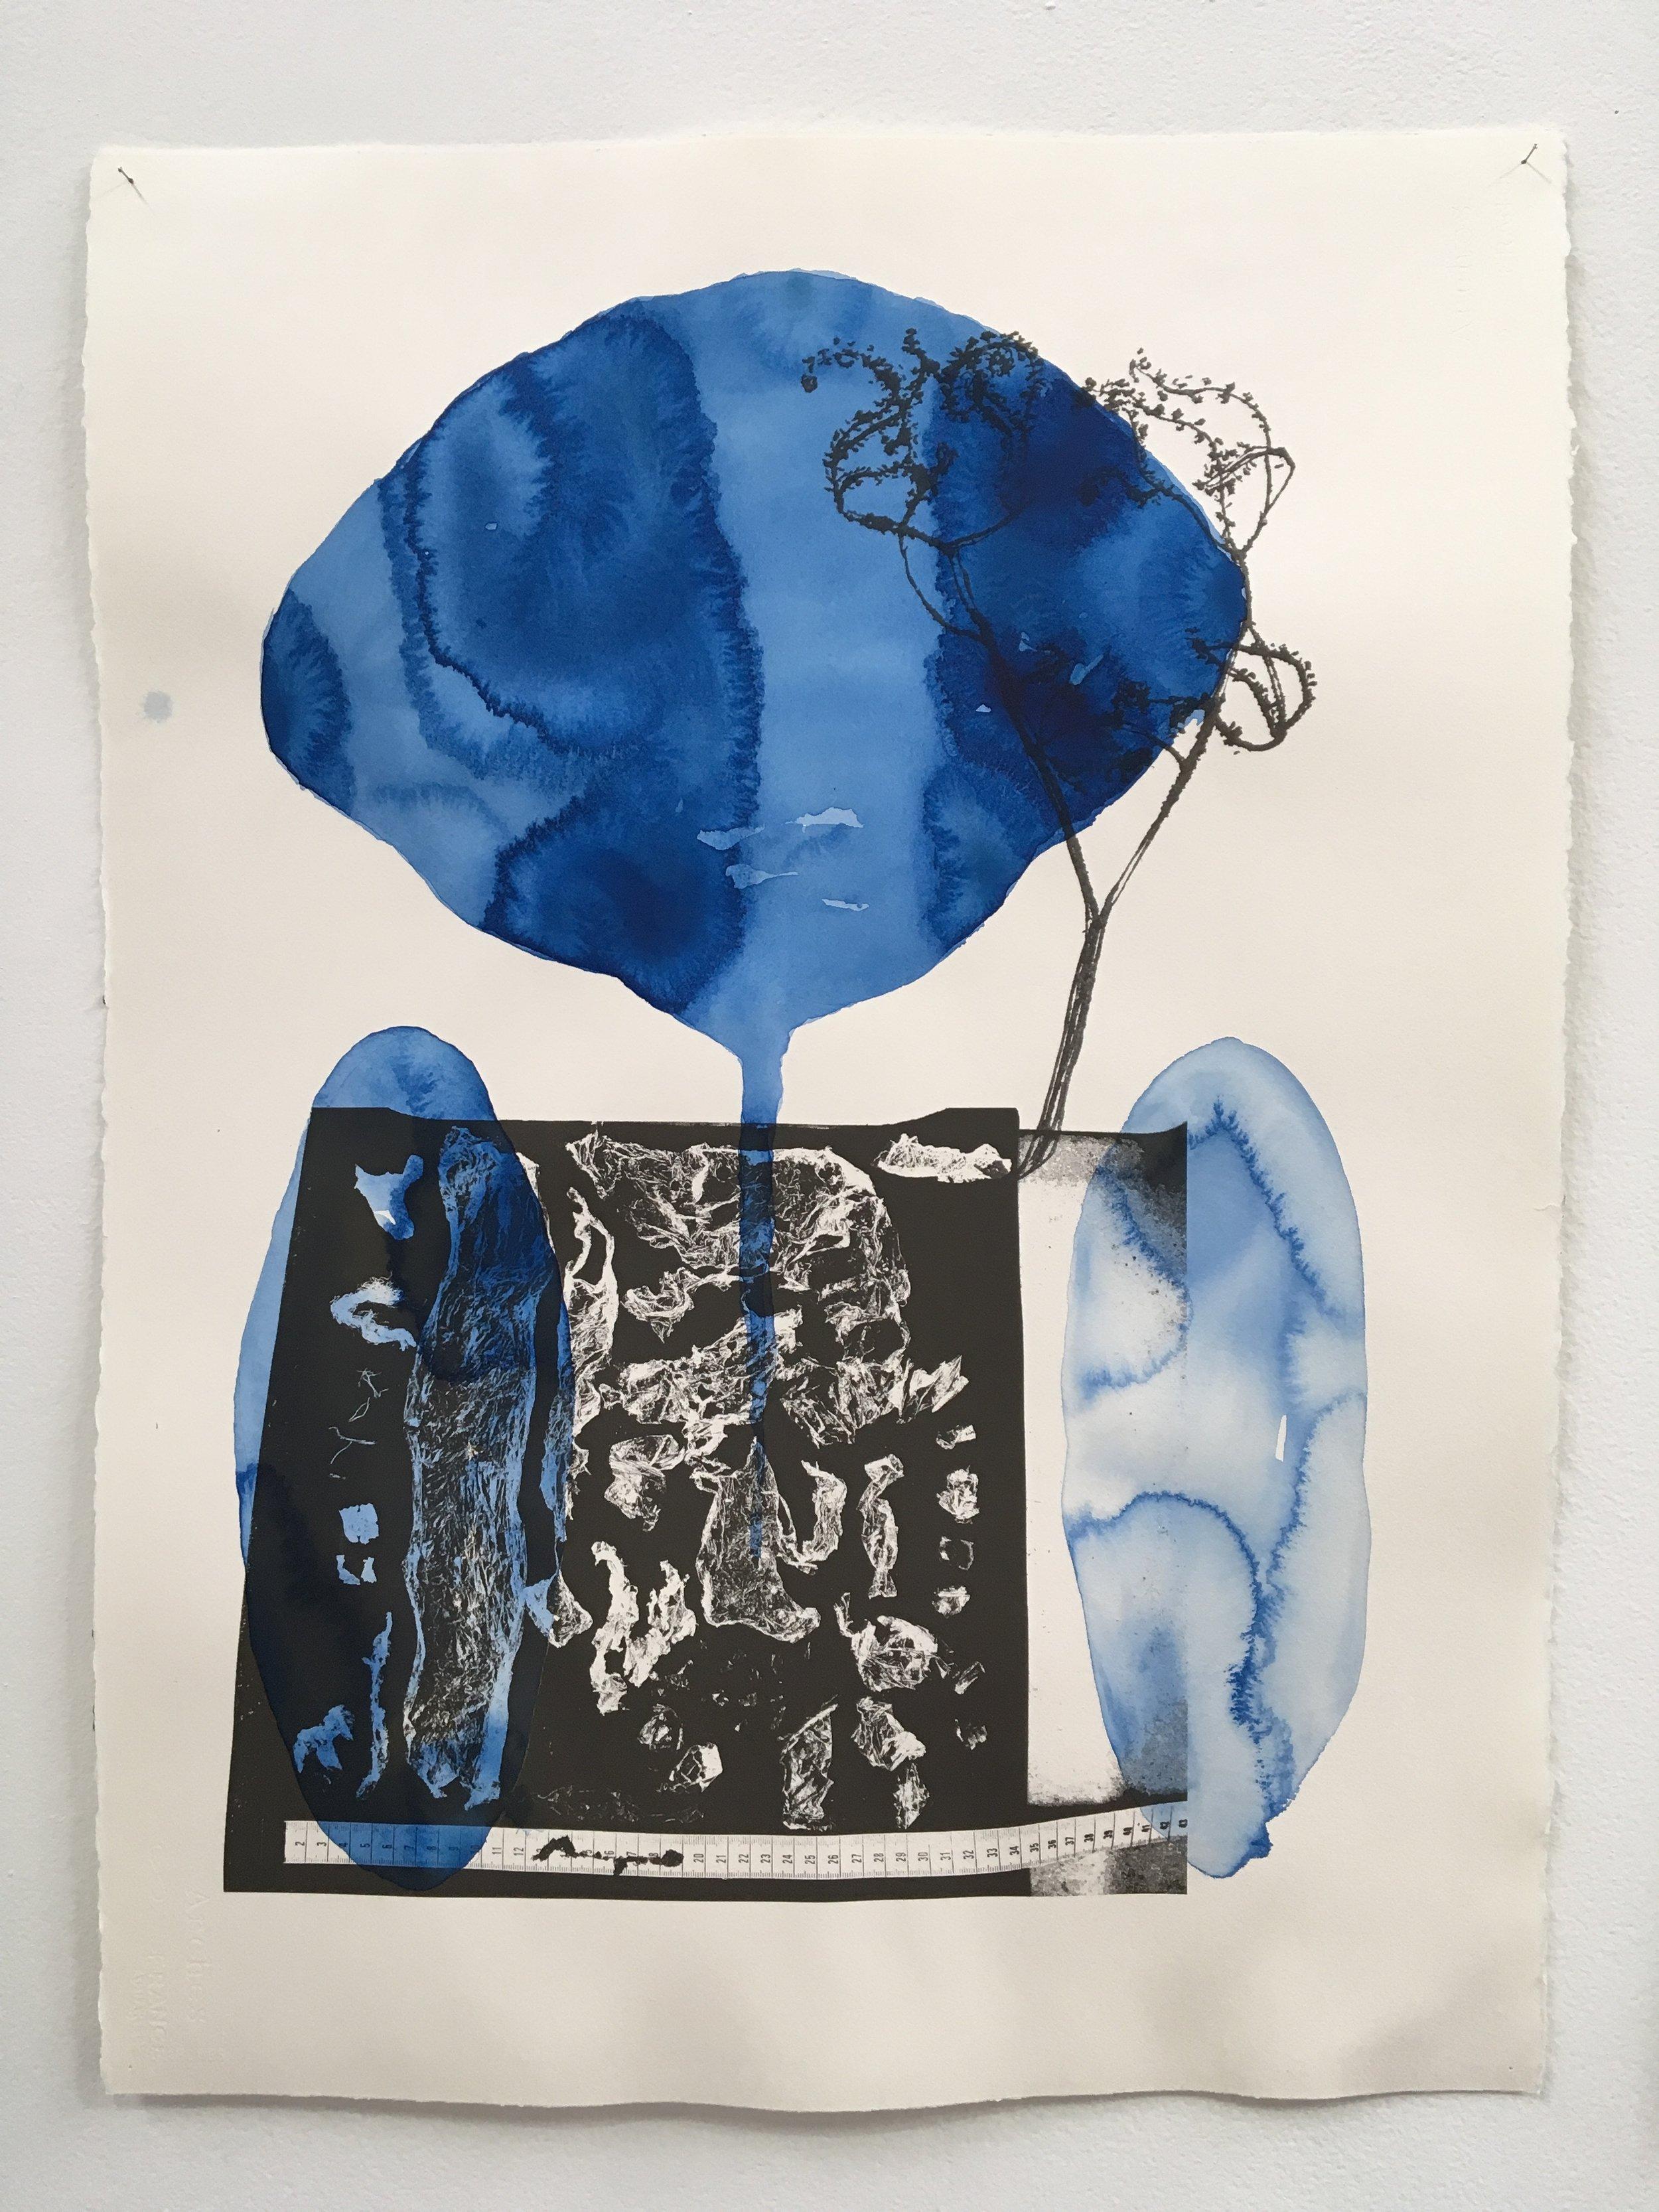 Judy Watson heron island 2 2009-16 acrylic and digital print on paper 77 x 57 cm.jpg